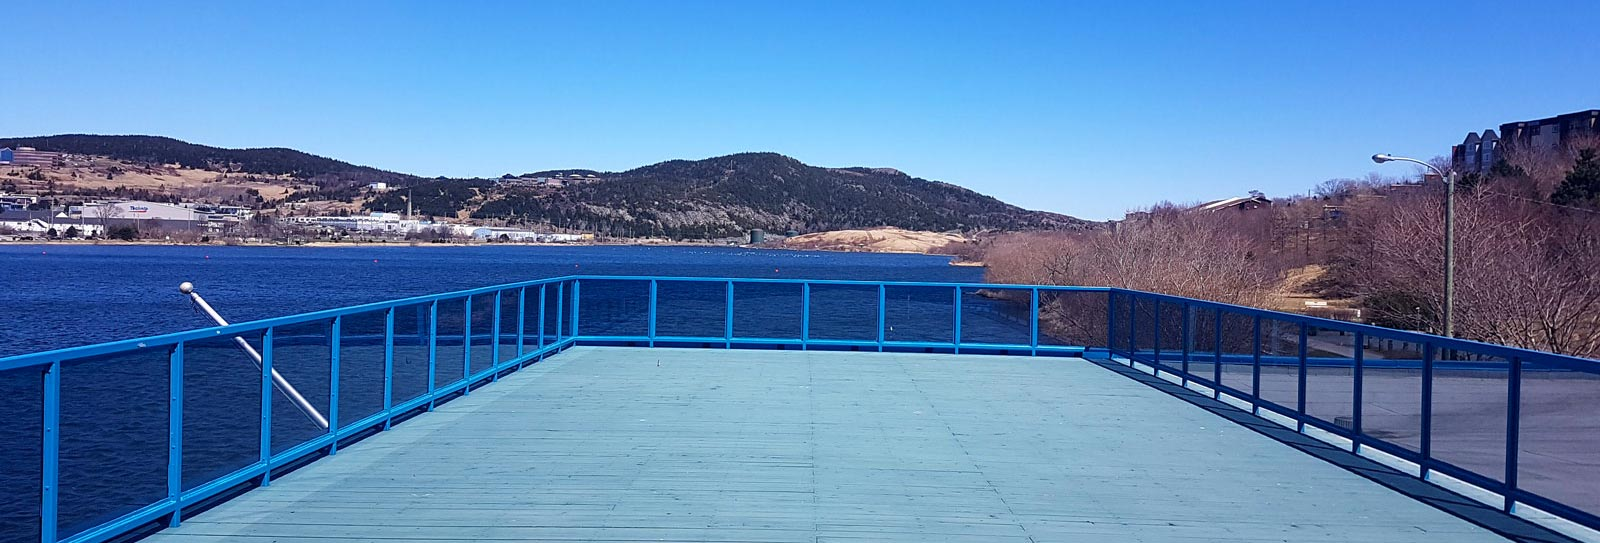 boathouse museum deck